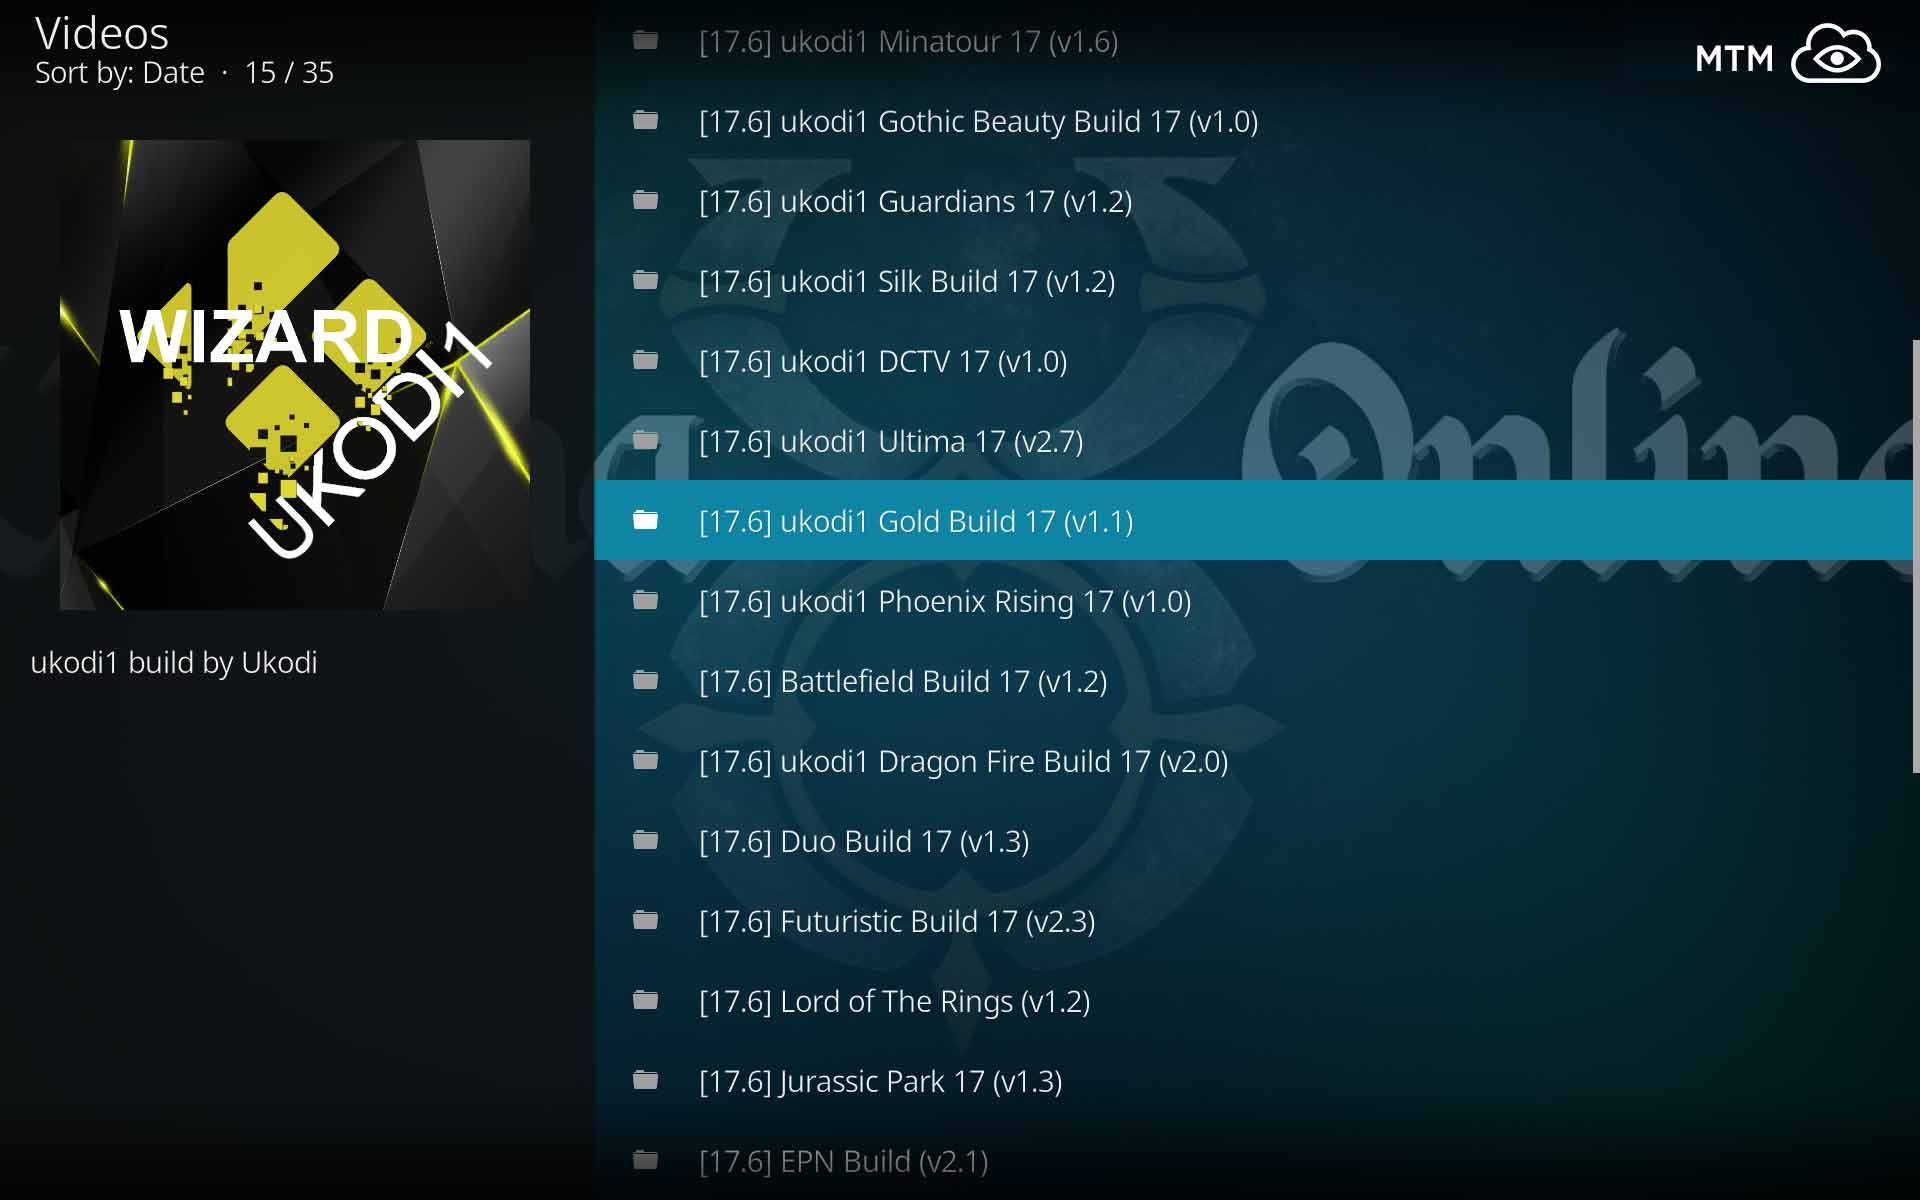 UKodi1 Gold Build | How to Install Fastest Kodi Firestick Build